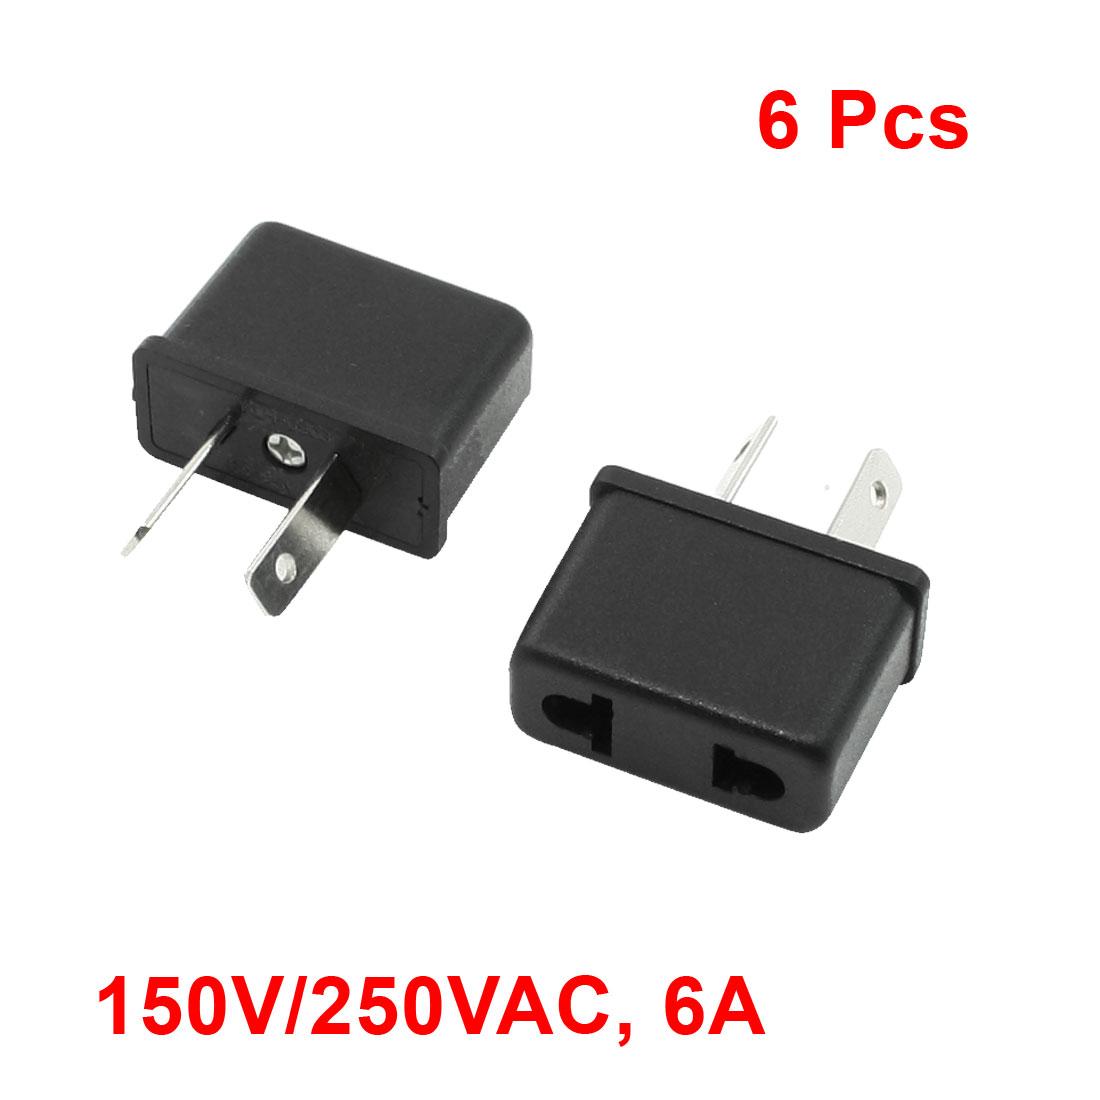 AU Plug to EU US Socket Travel Adapter Convertor AC 125V/250V 6A 6 Pcs